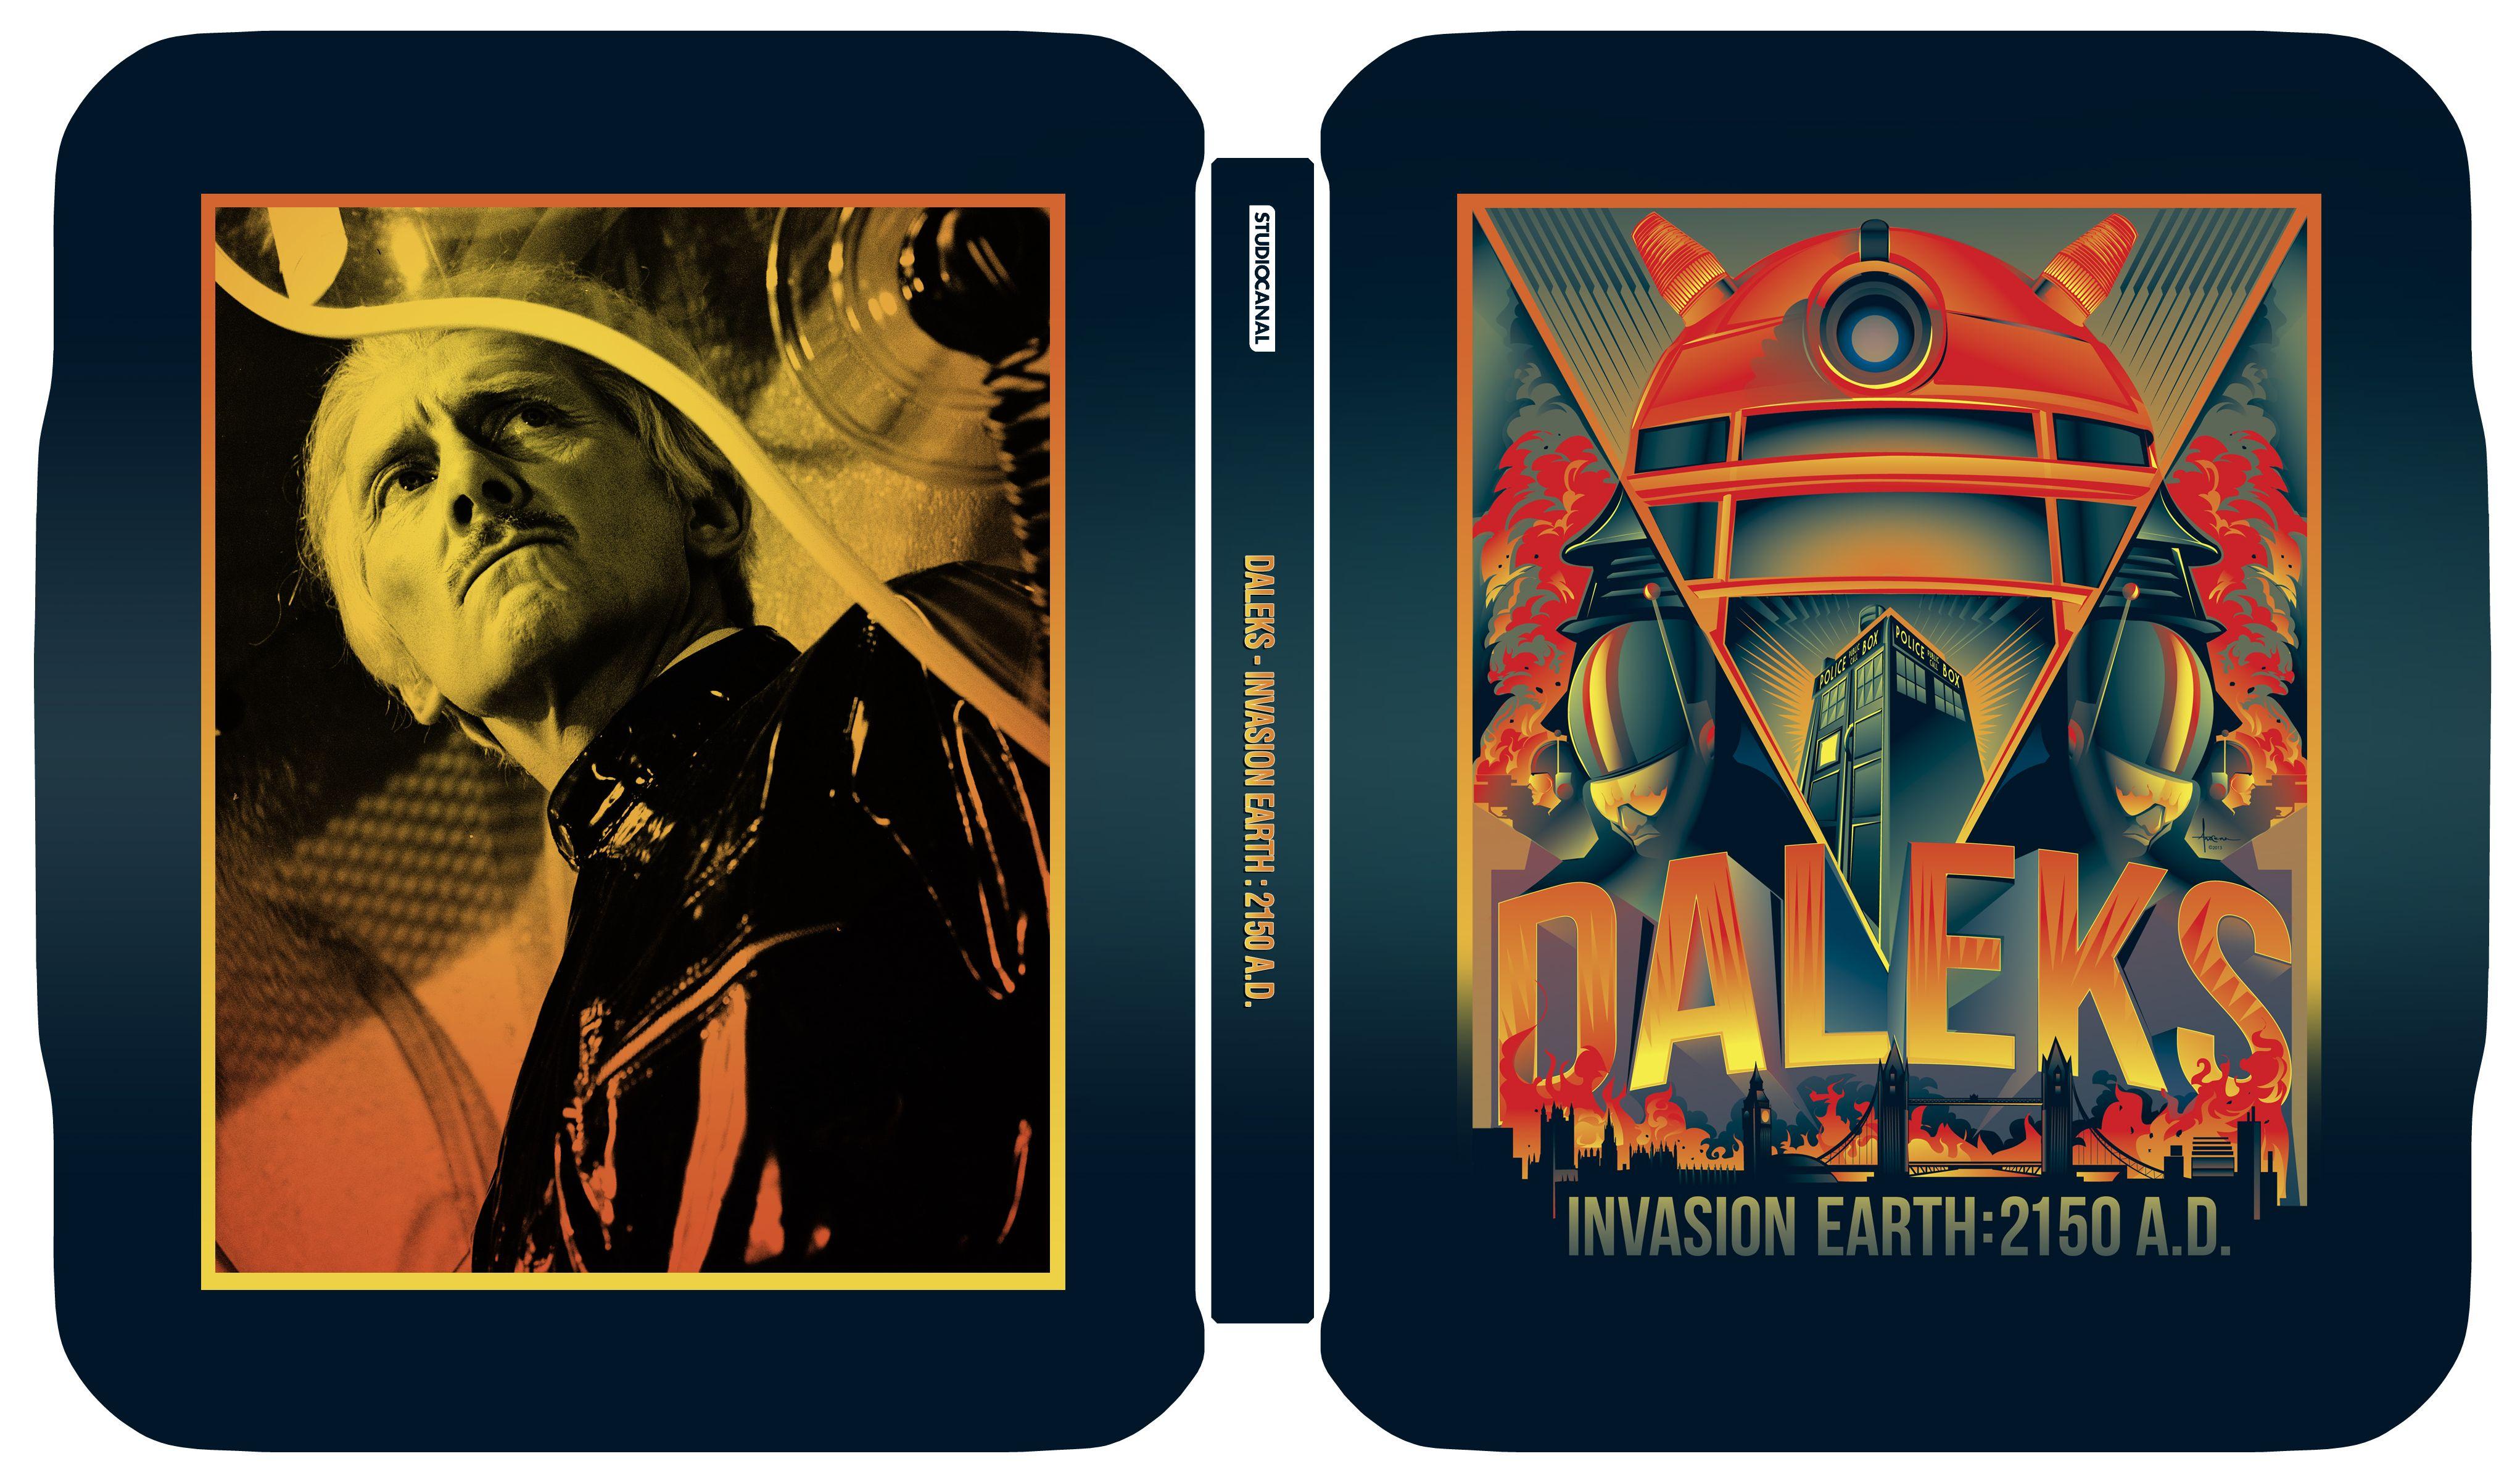 Daleks - Invasion 2150AD Bluray Limited Edition Steelbook (Credit: Zavvi/SteelbookBluray)